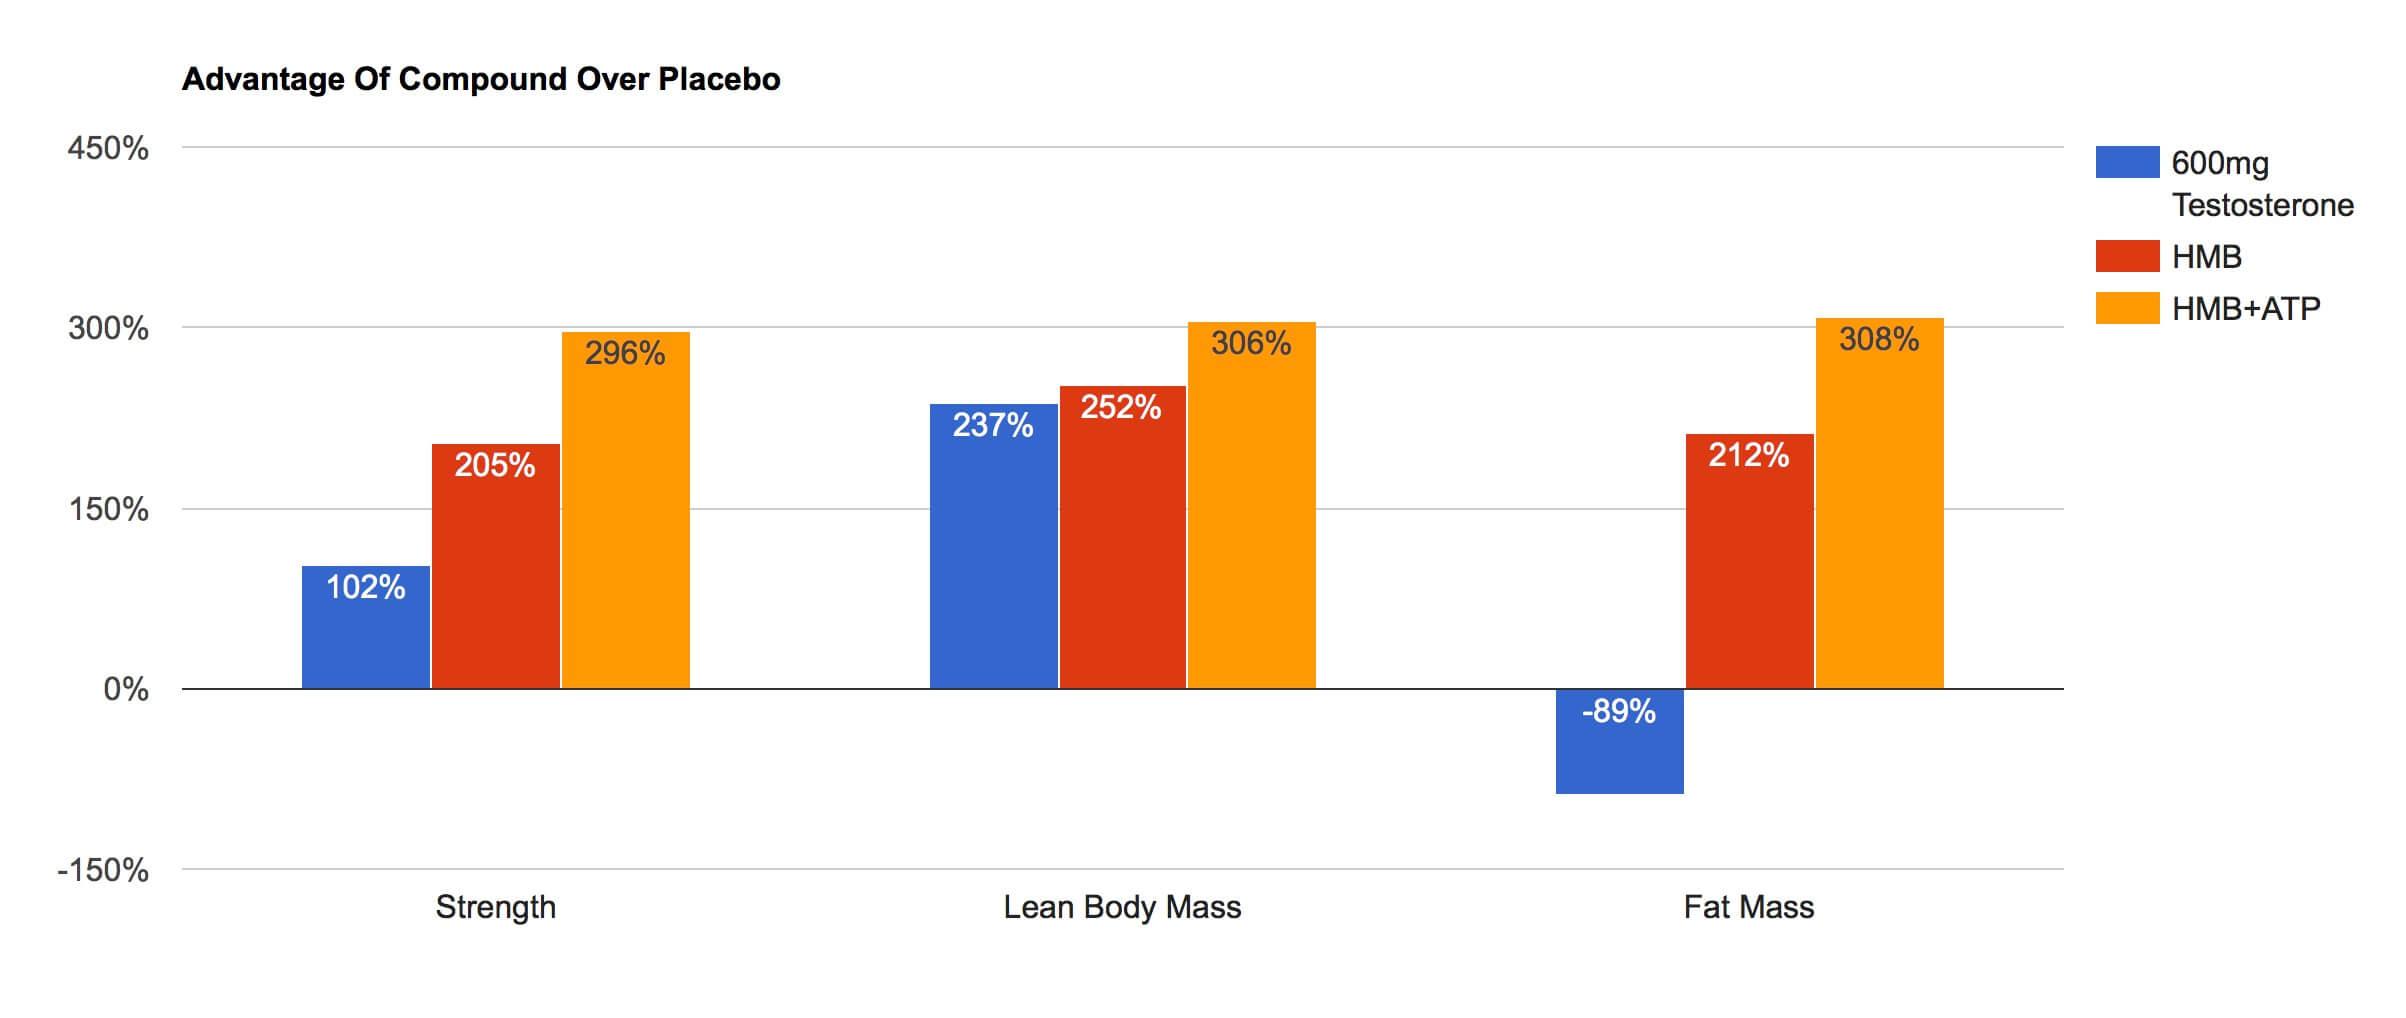 HMB and testosterone vs. Placebo